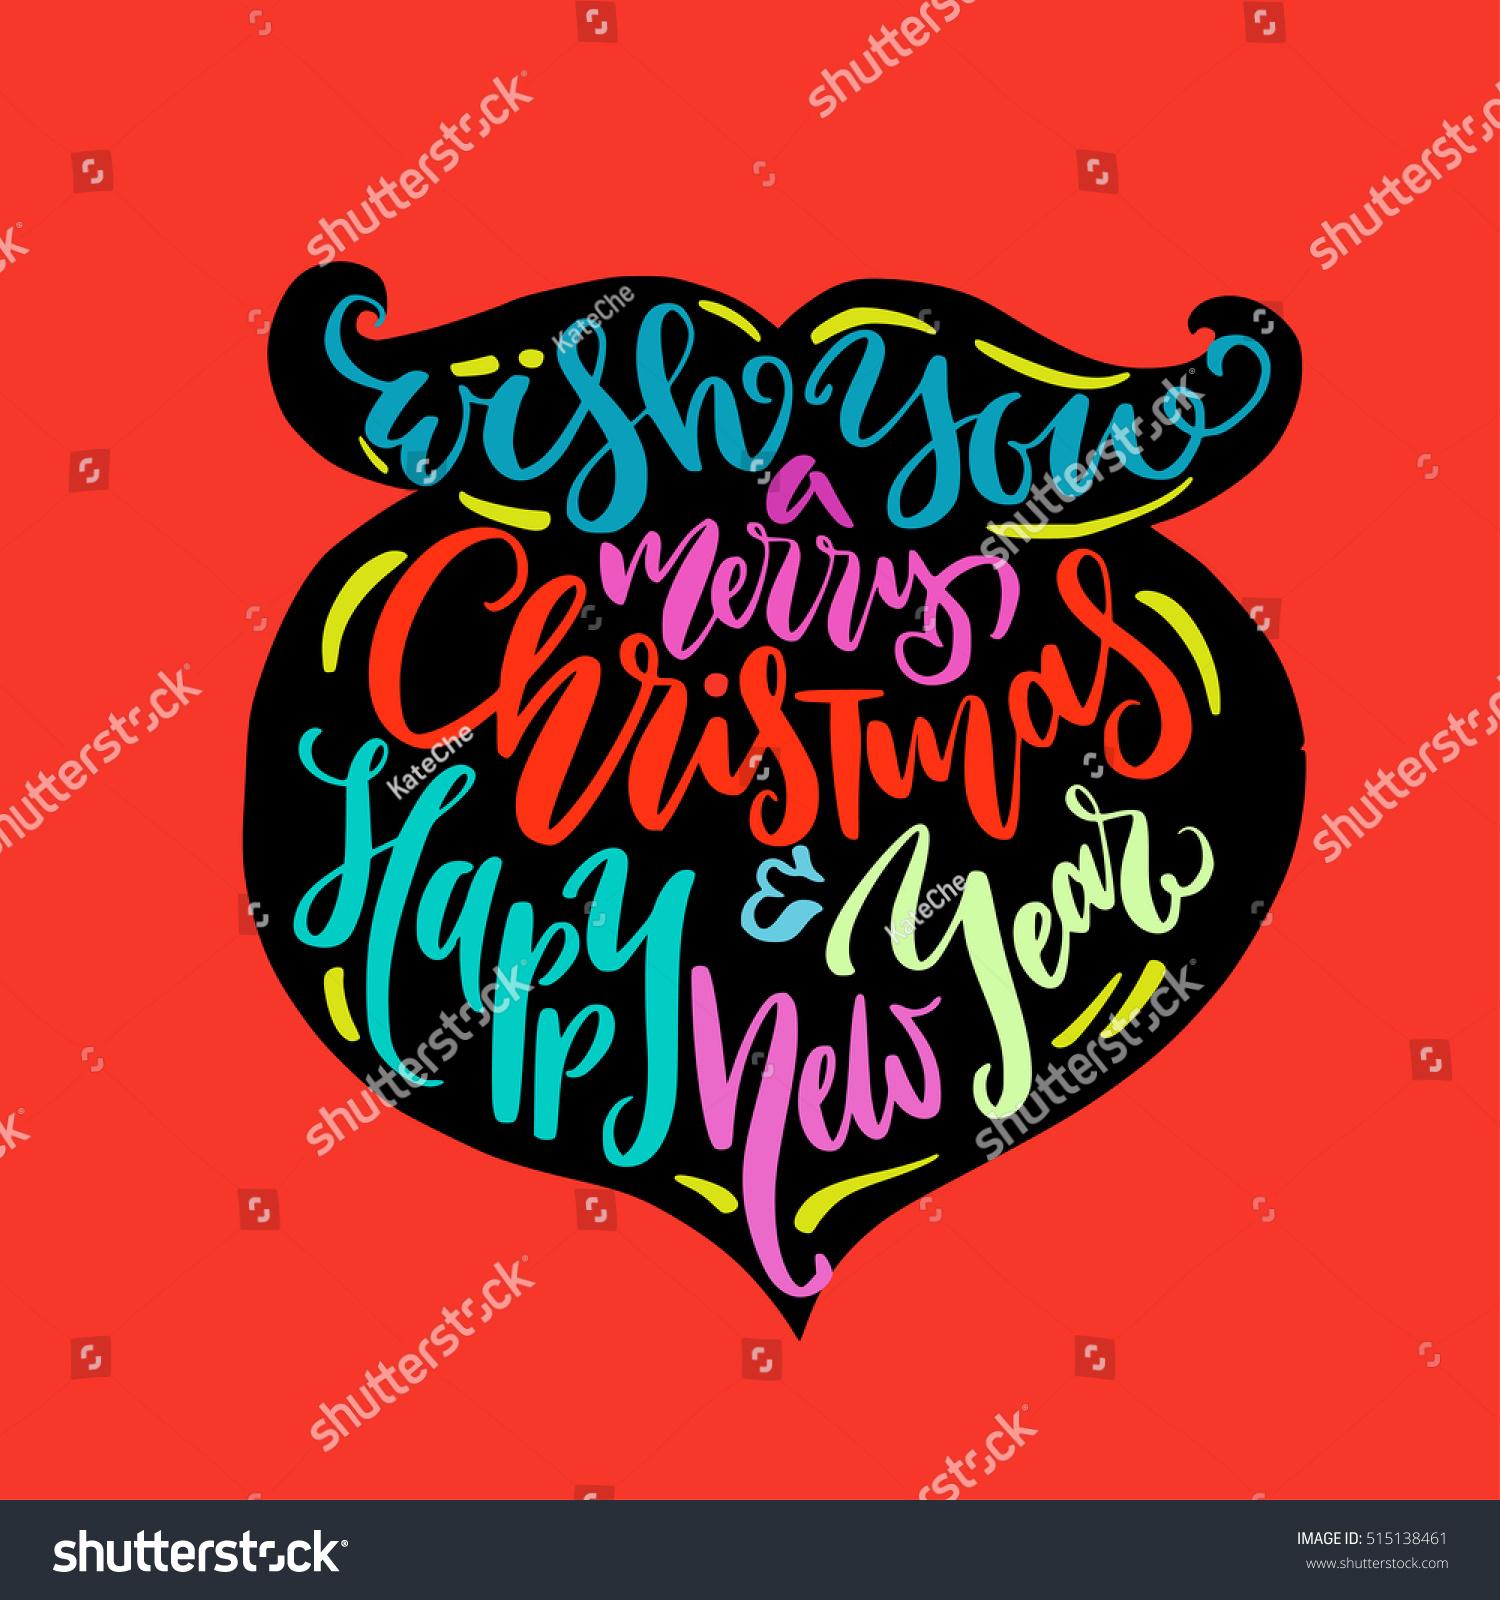 Christmas illustration beard silhouette calligraphy greetings stock christmas illustration beard silhouette calligraphy greetings stock vector 515138461 shutterstock kristyandbryce Gallery